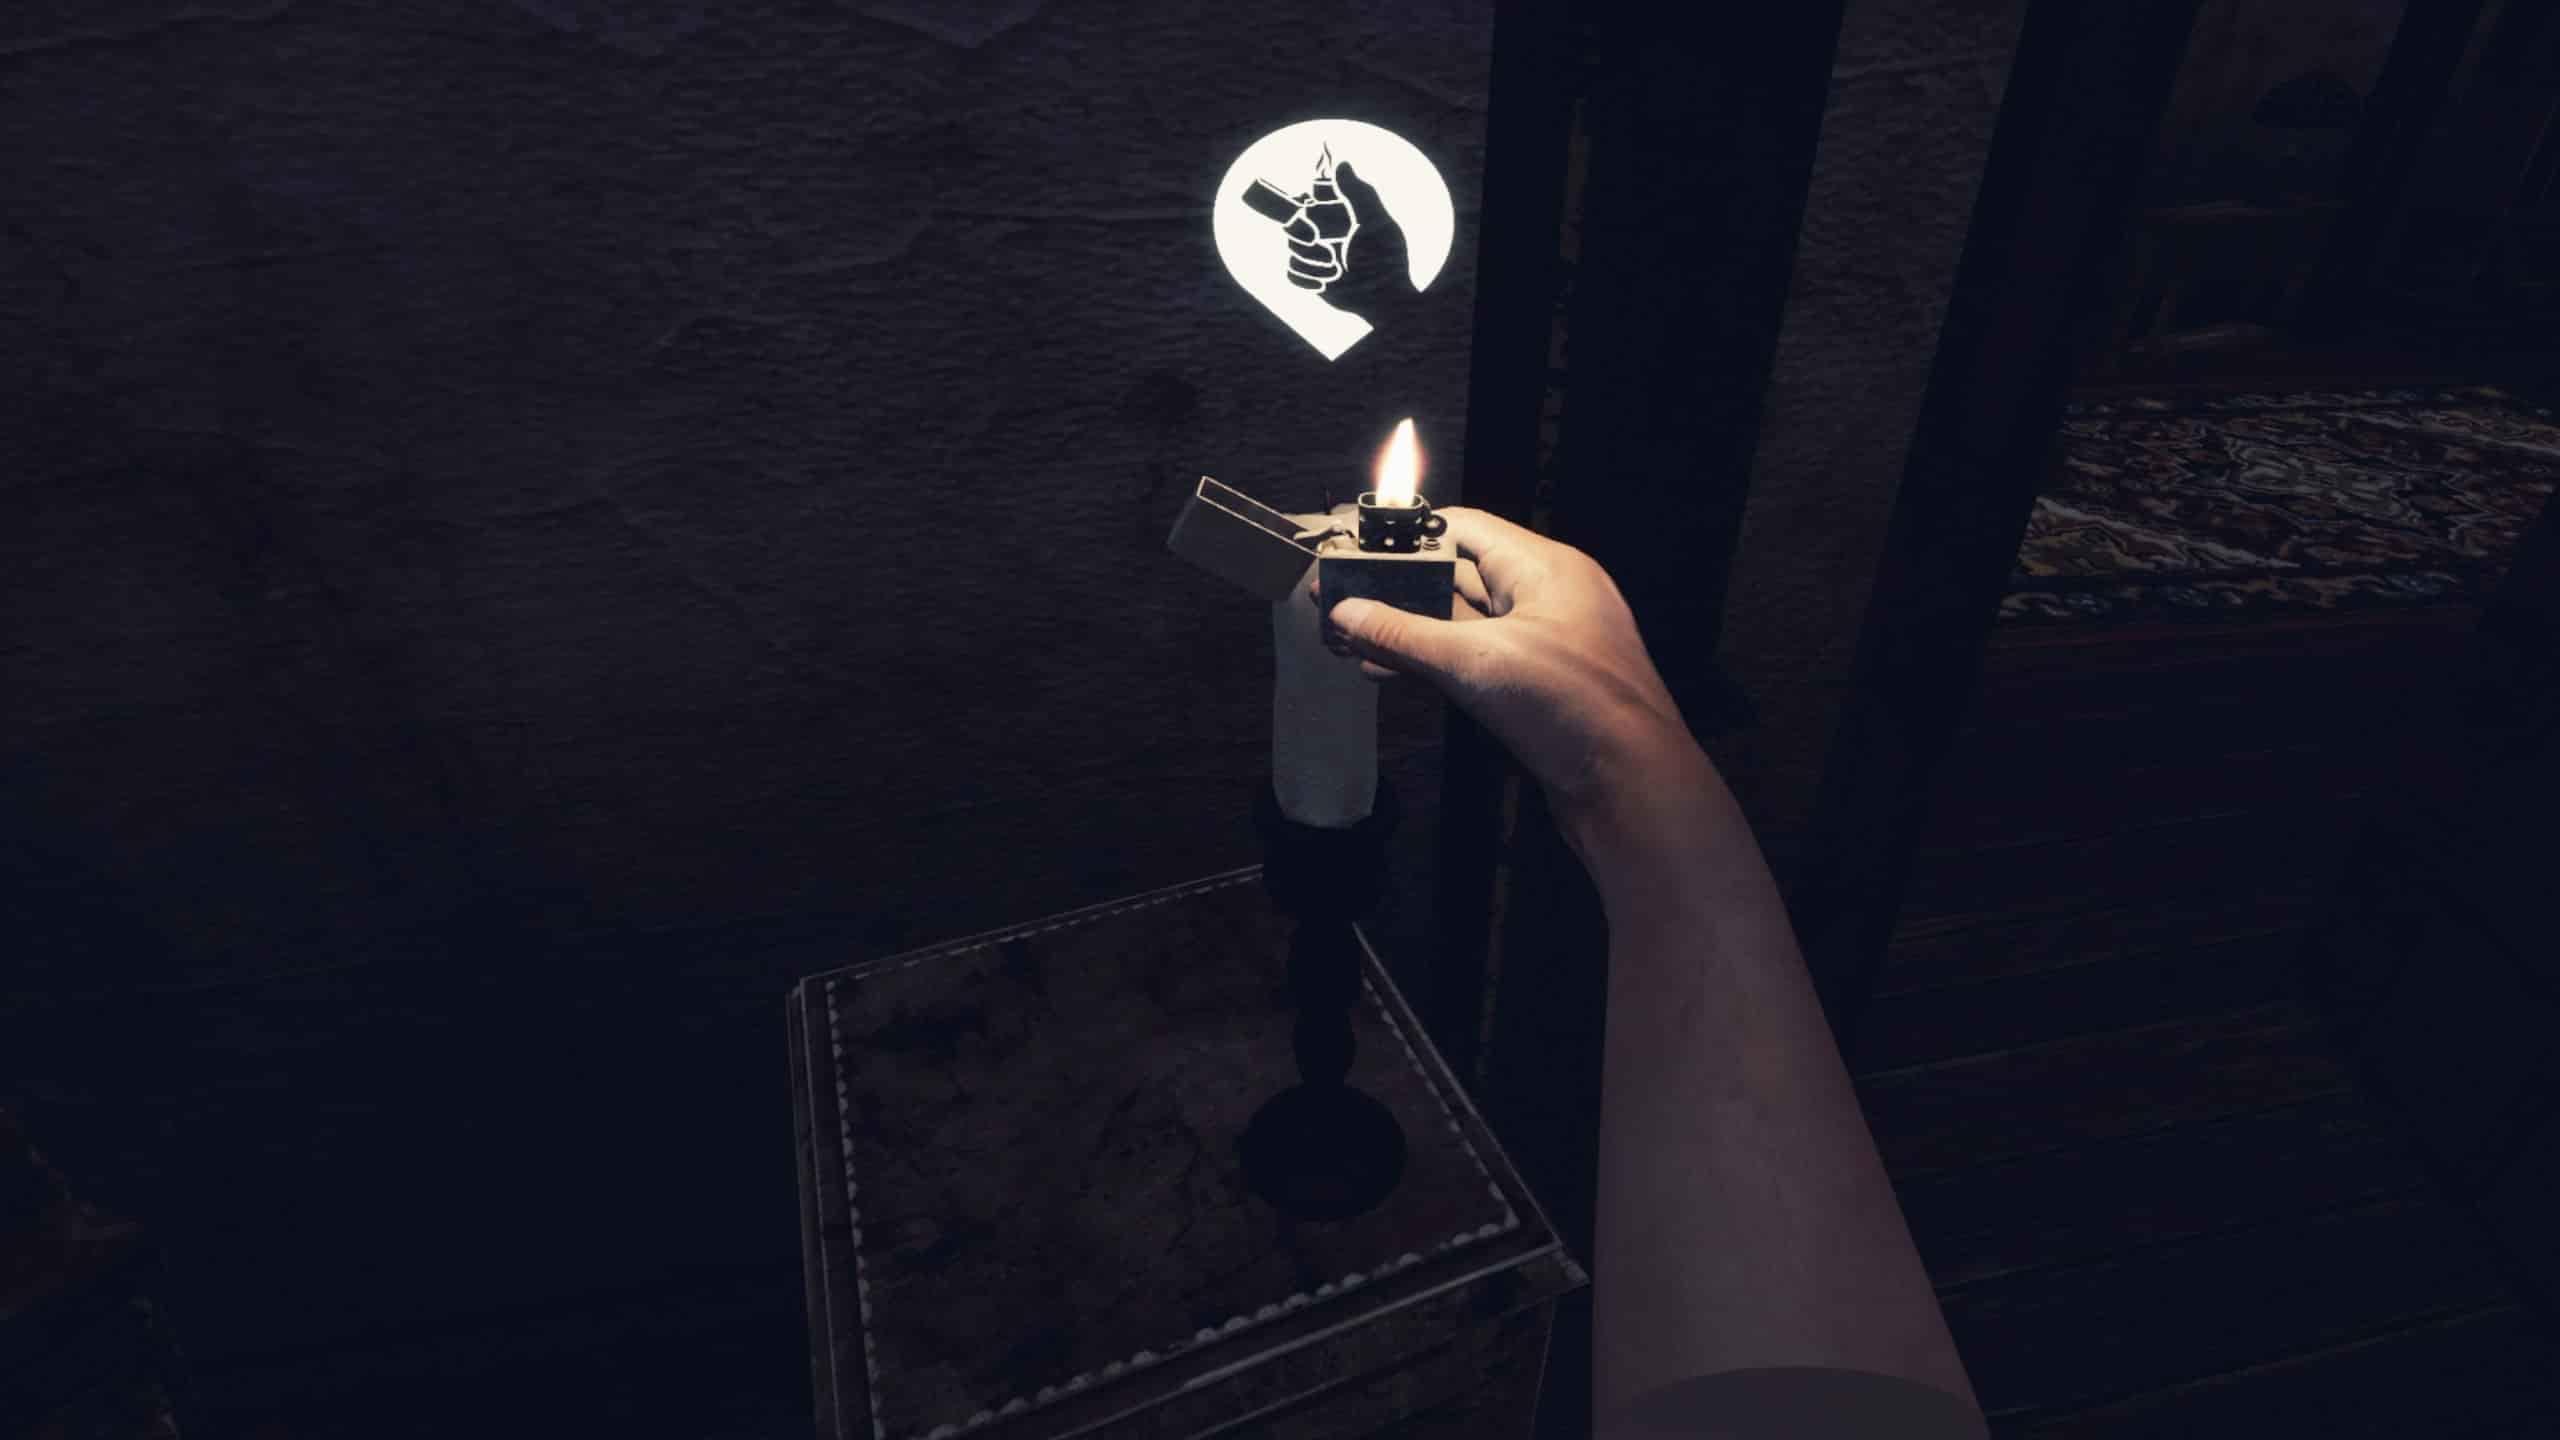 Dreambakc VR